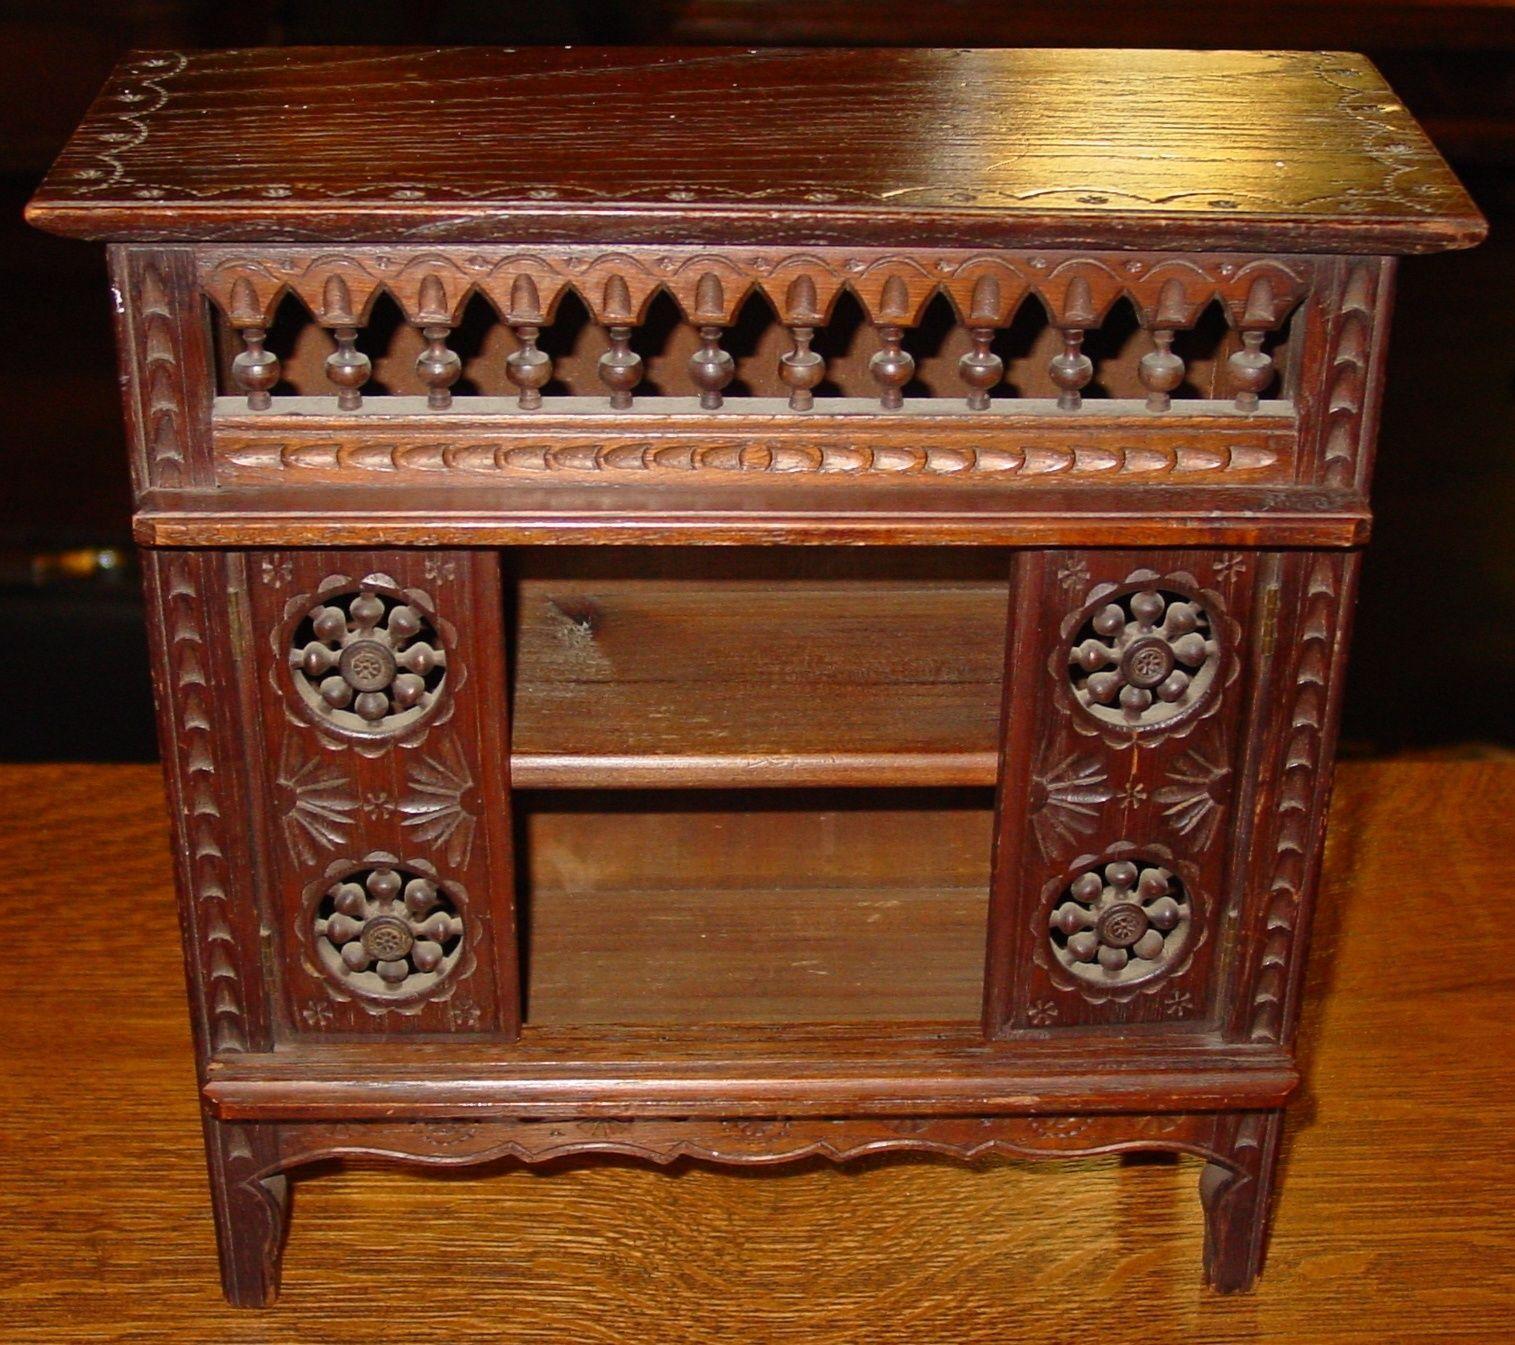 Late Victorian antique salesman sample cabinet-detailed precise workmnship-15033 | eBay